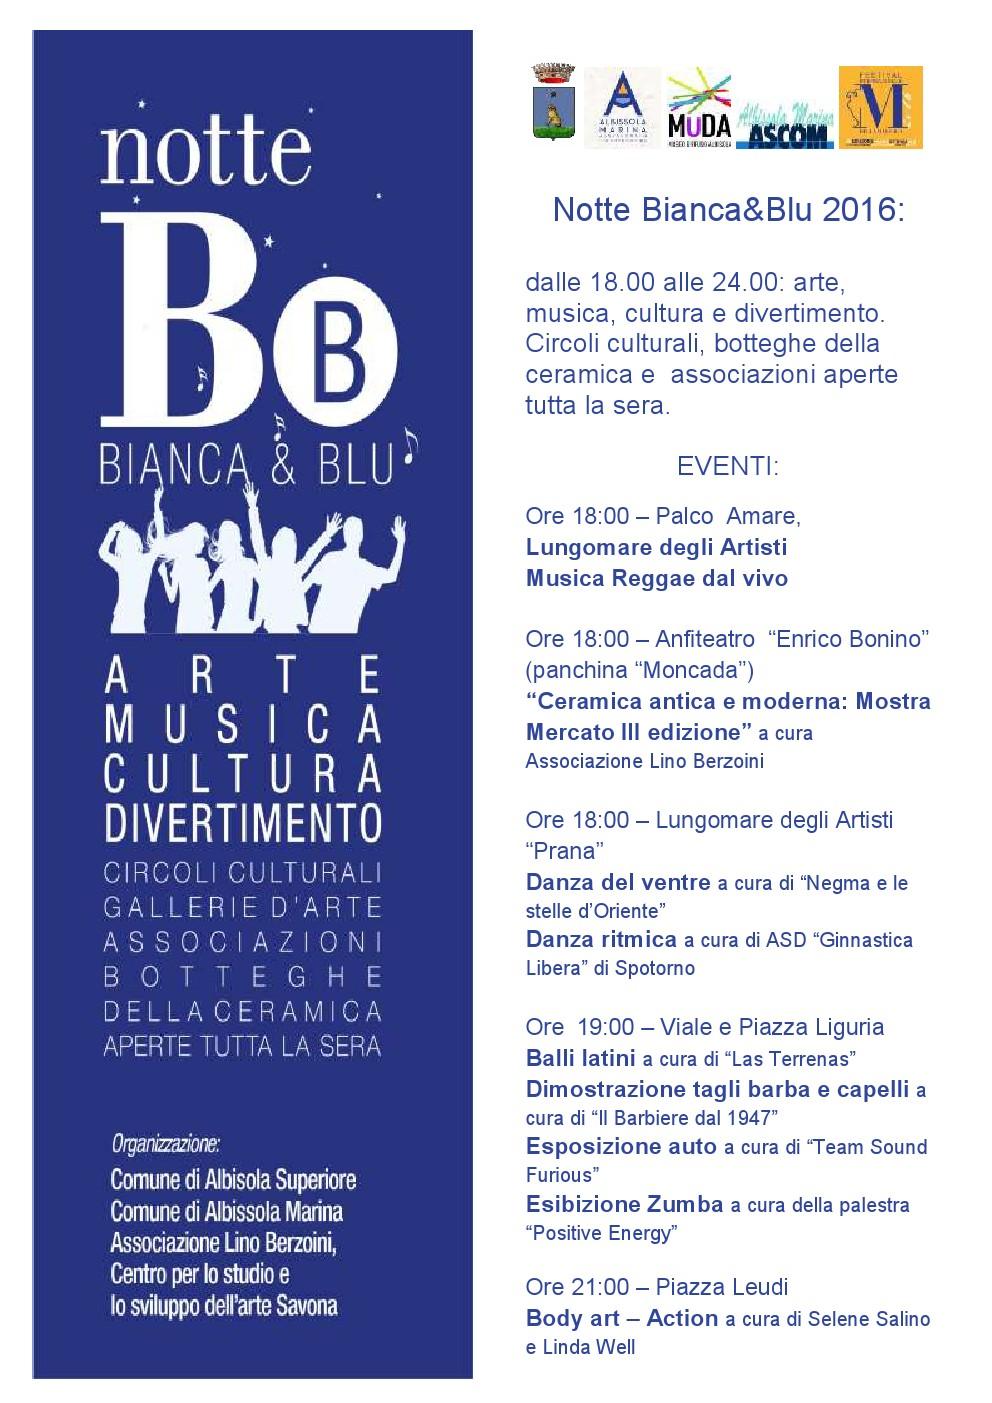 Albissola Marina-NOTTE B&b BIANCA&BLU